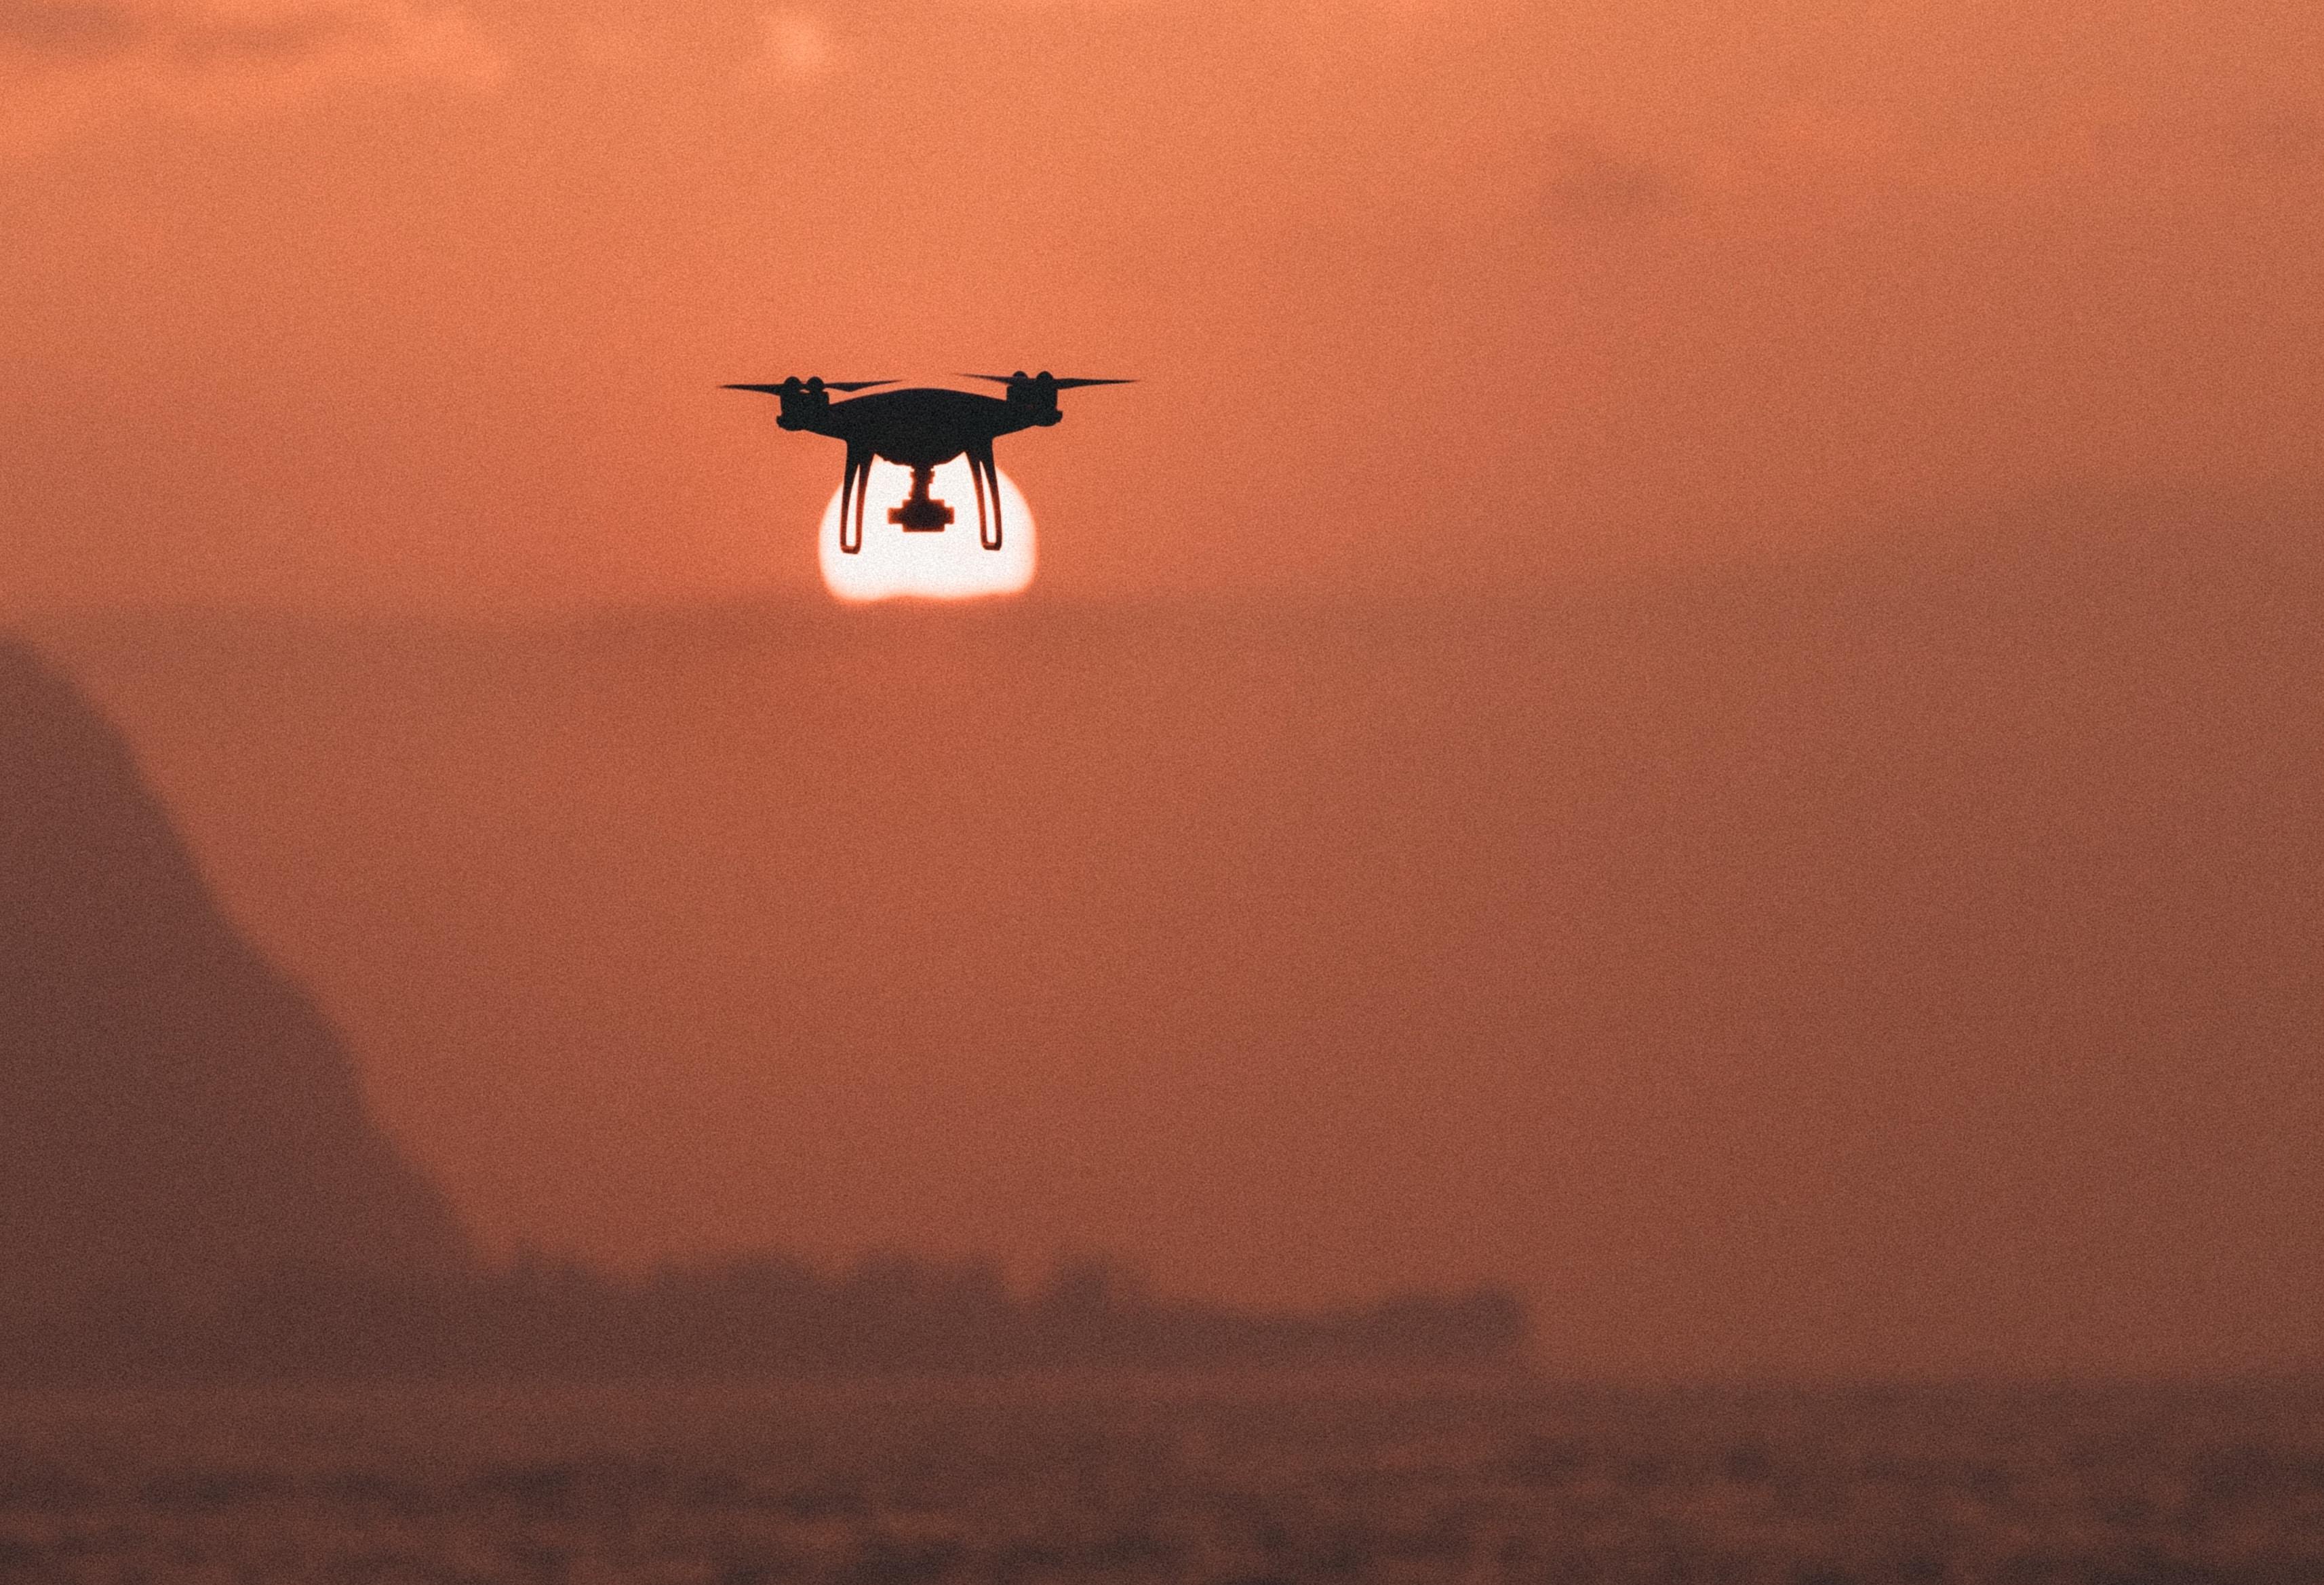 dron-naplemente-tenger-jakob-owens-221519-unsplash.jpg